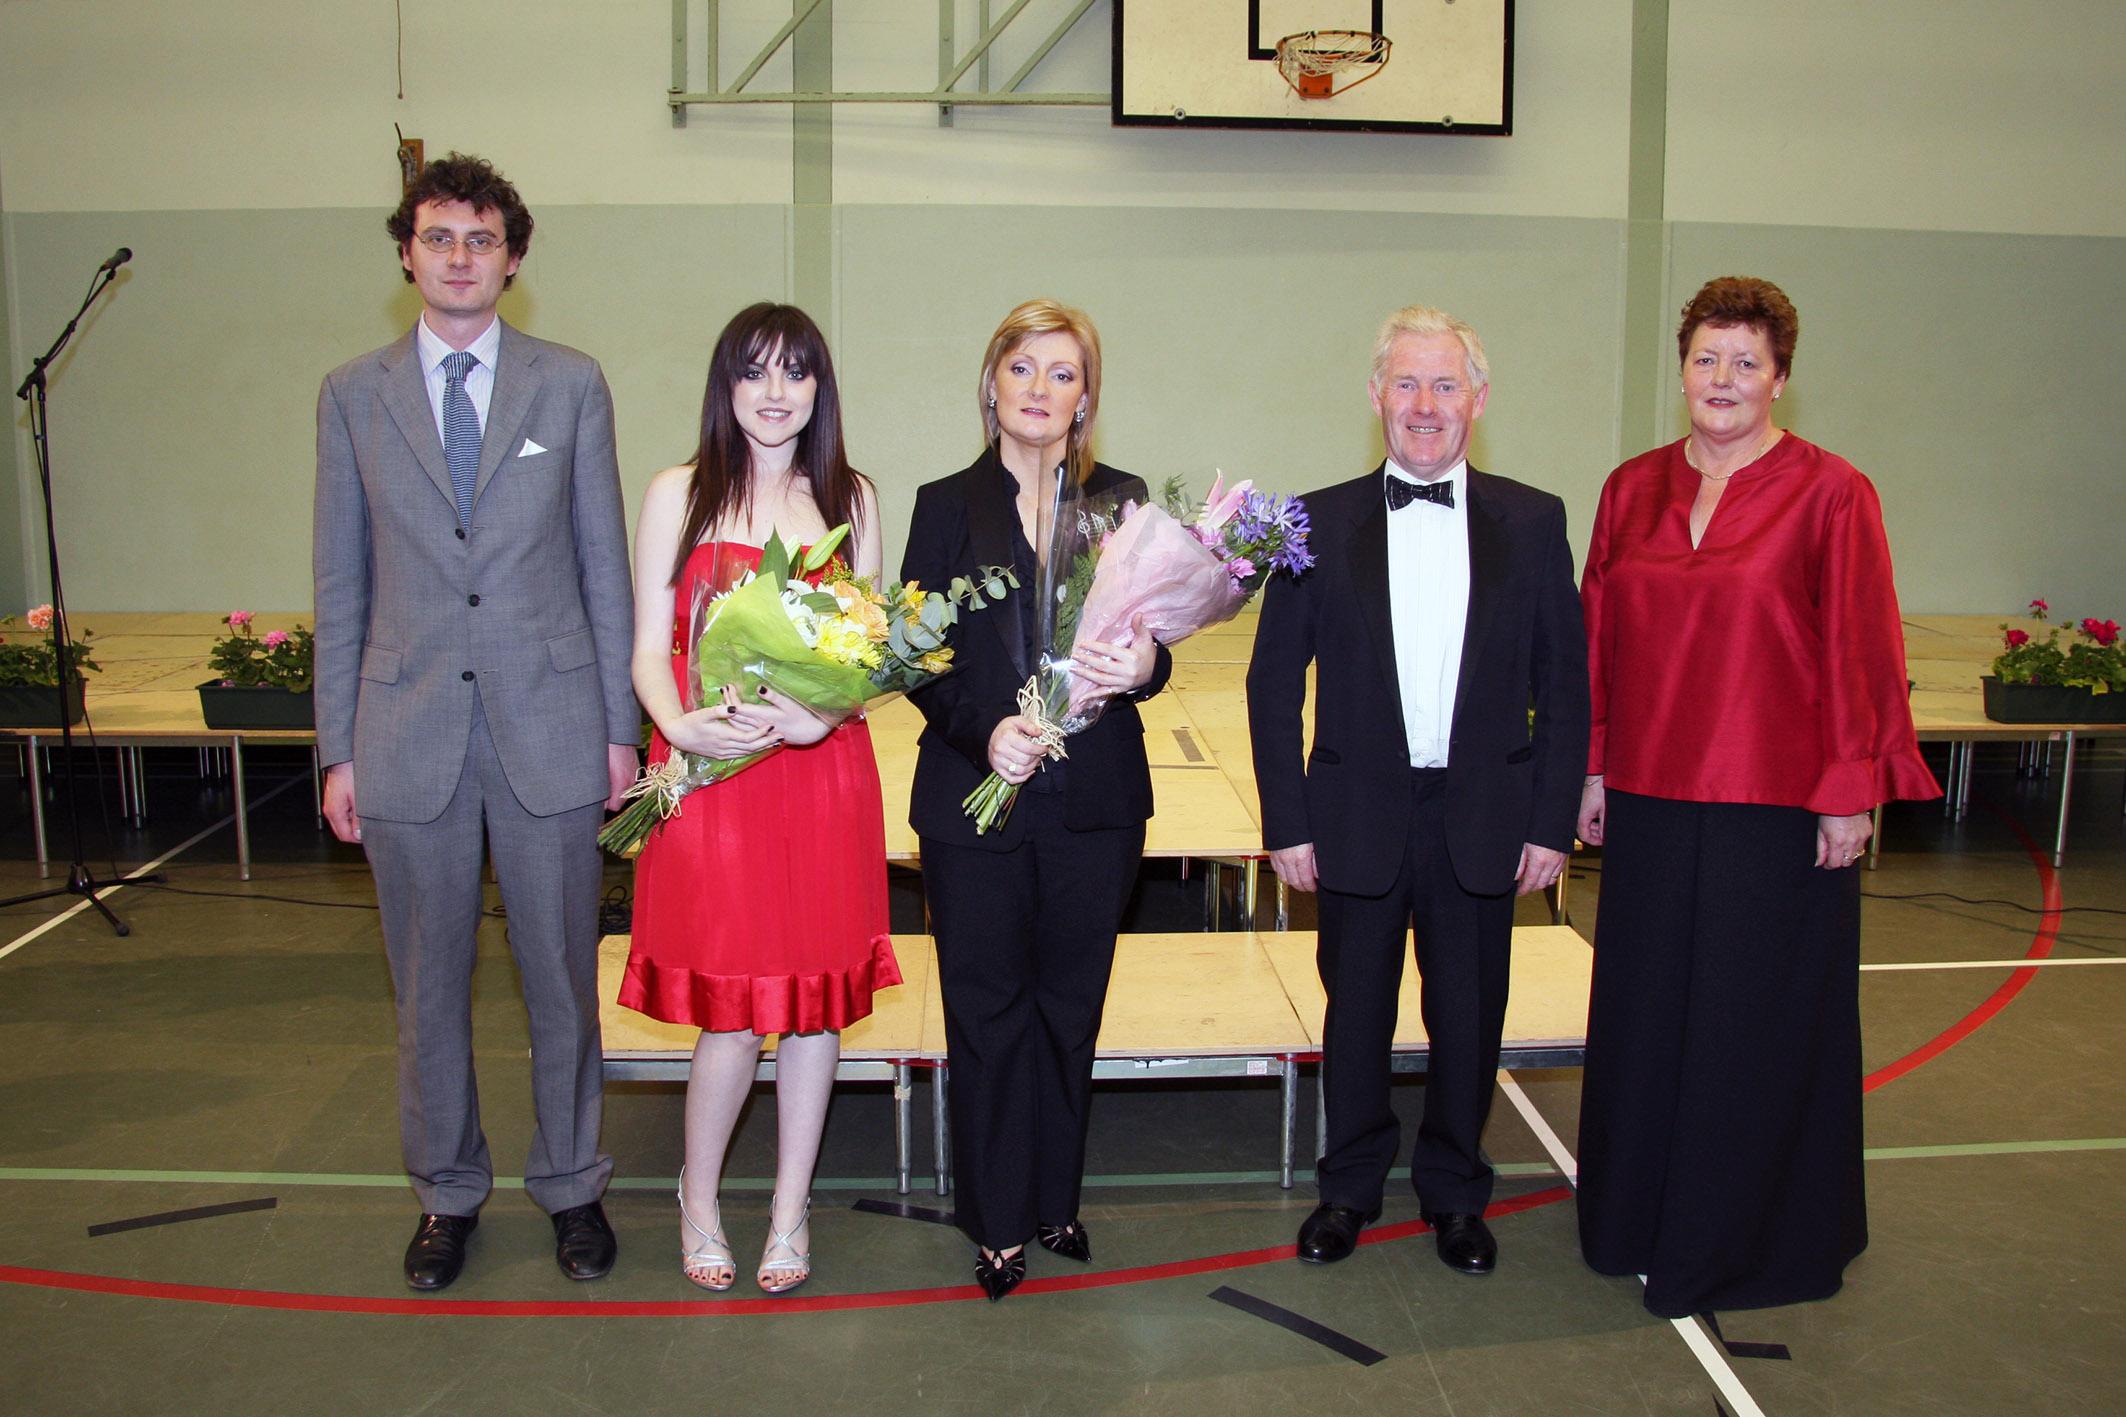 Mark McGrath, Niamh Perry, Sheelagh Greer, Ian Coalter and Barbara Lowry